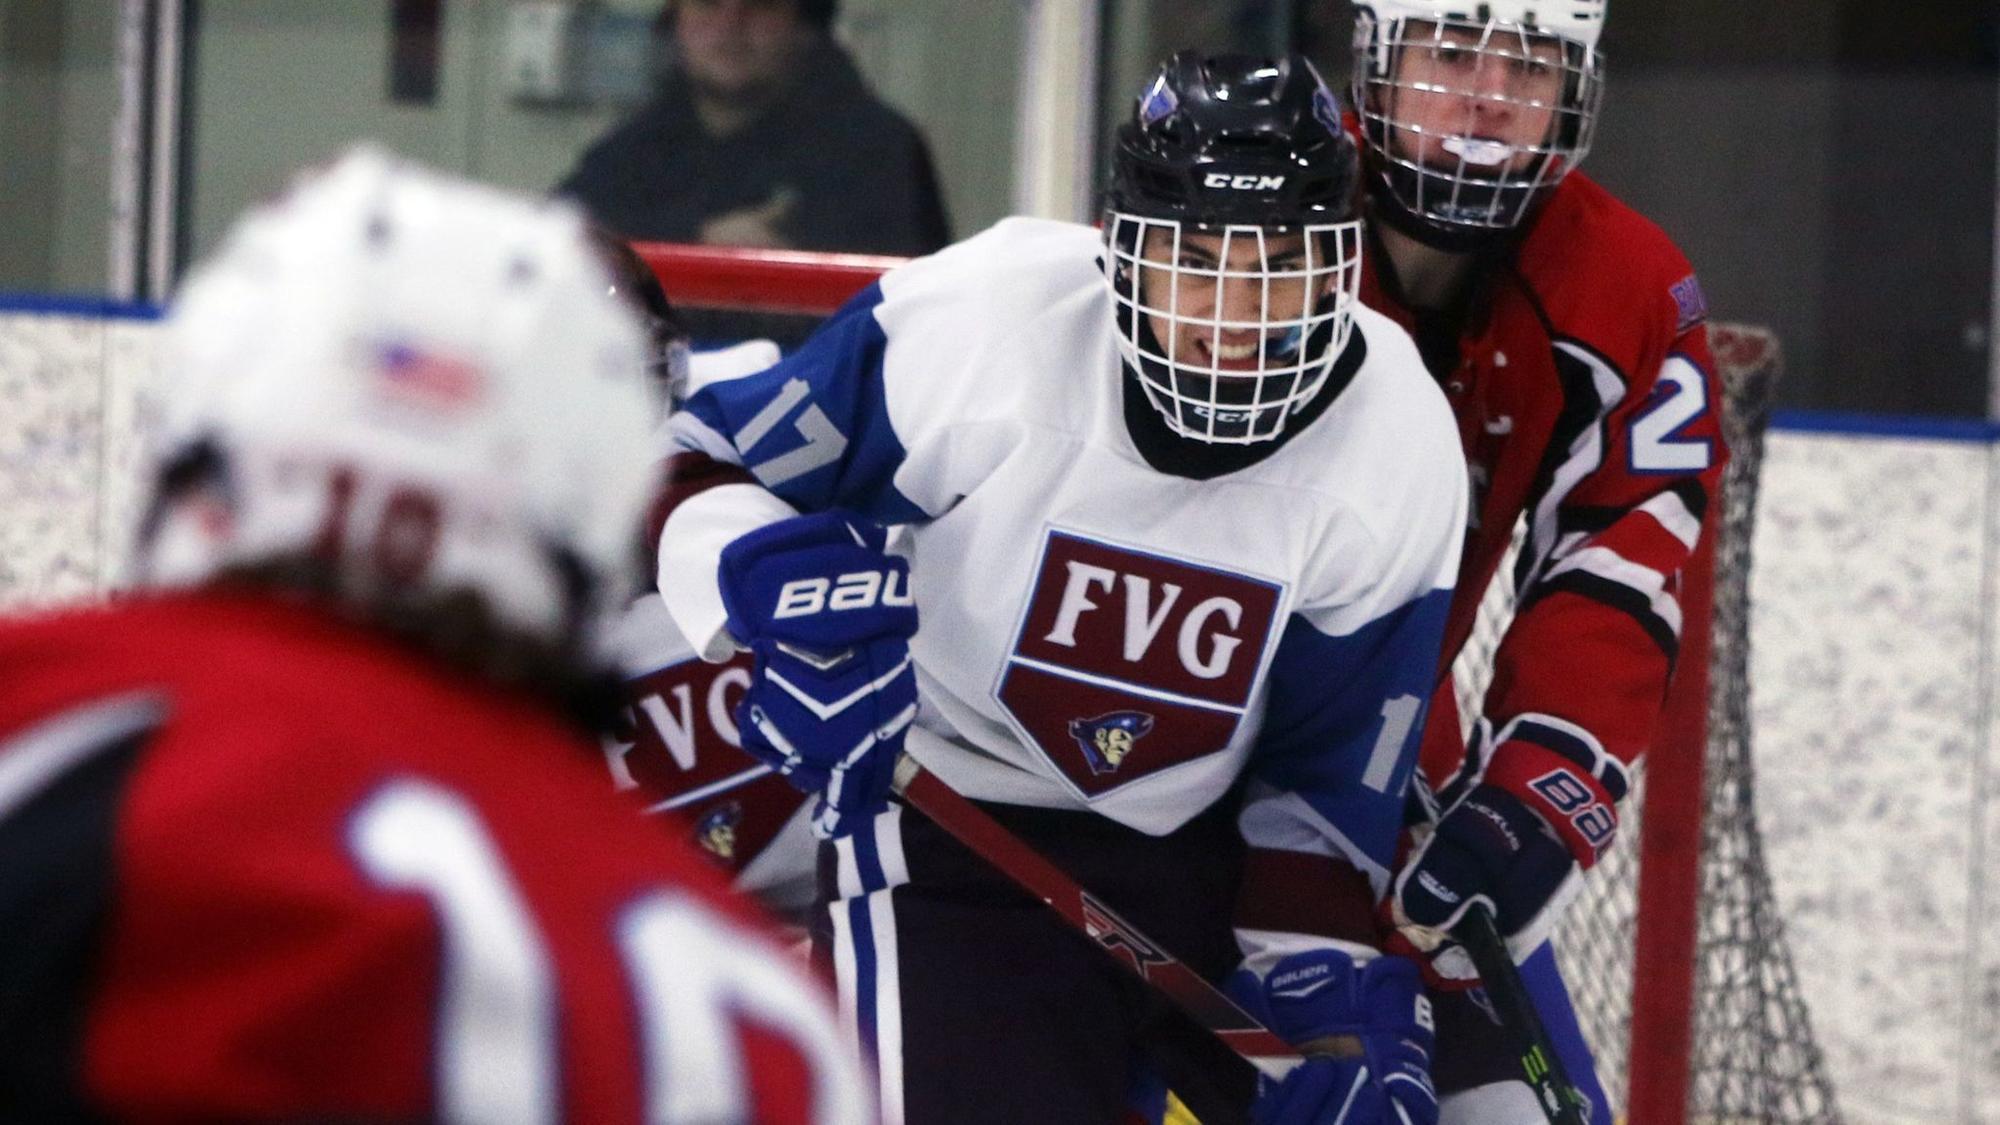 Boys Hockey: Defense Helps Farmington Valley Overcome Slow Start